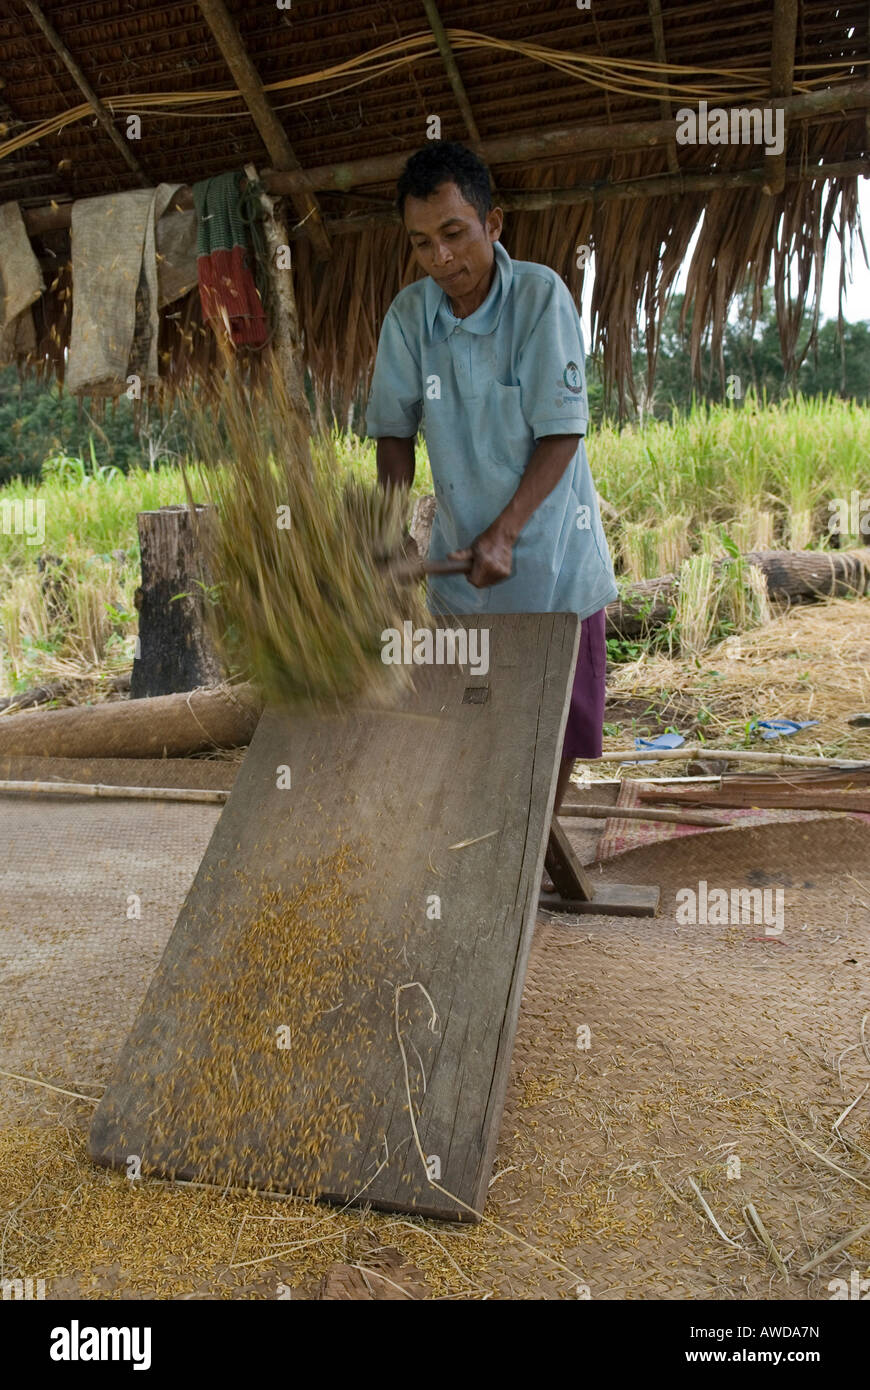 Farmer flailing rice ears, Koh Kong Province, Cambodia - Stock Image